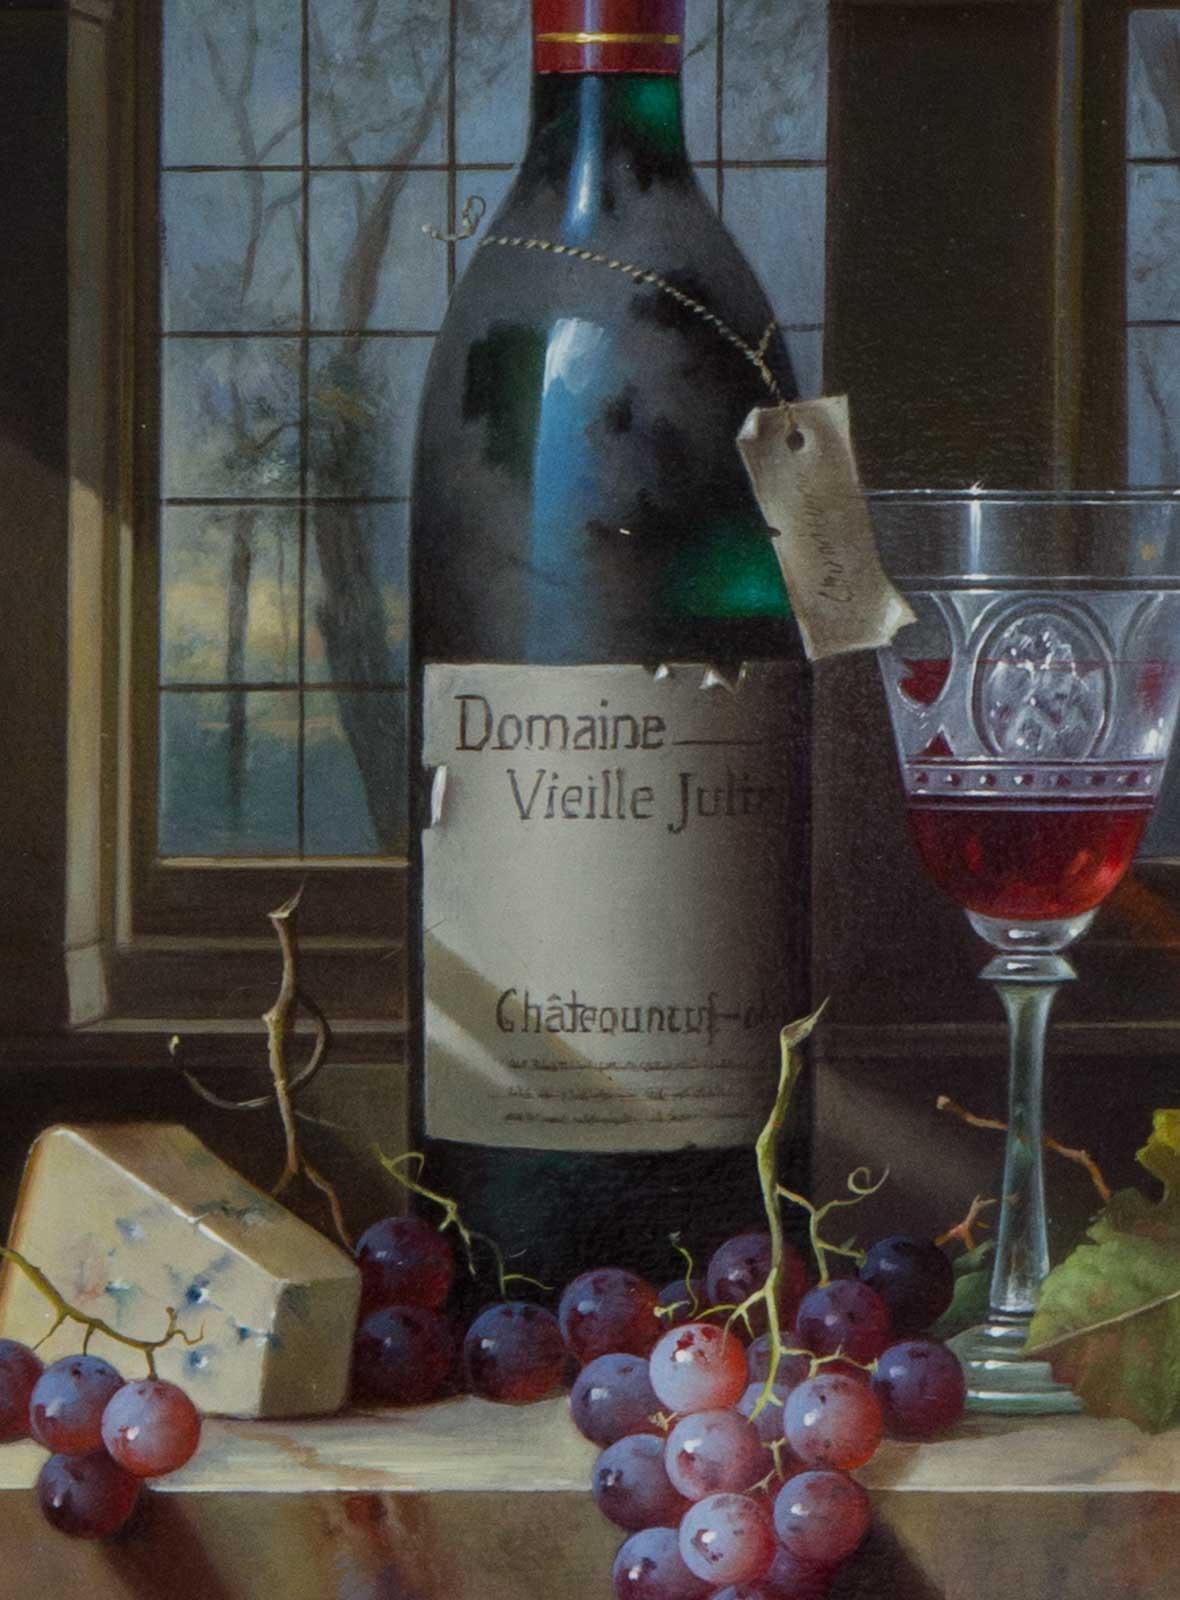 Domaine Vieille Julienne